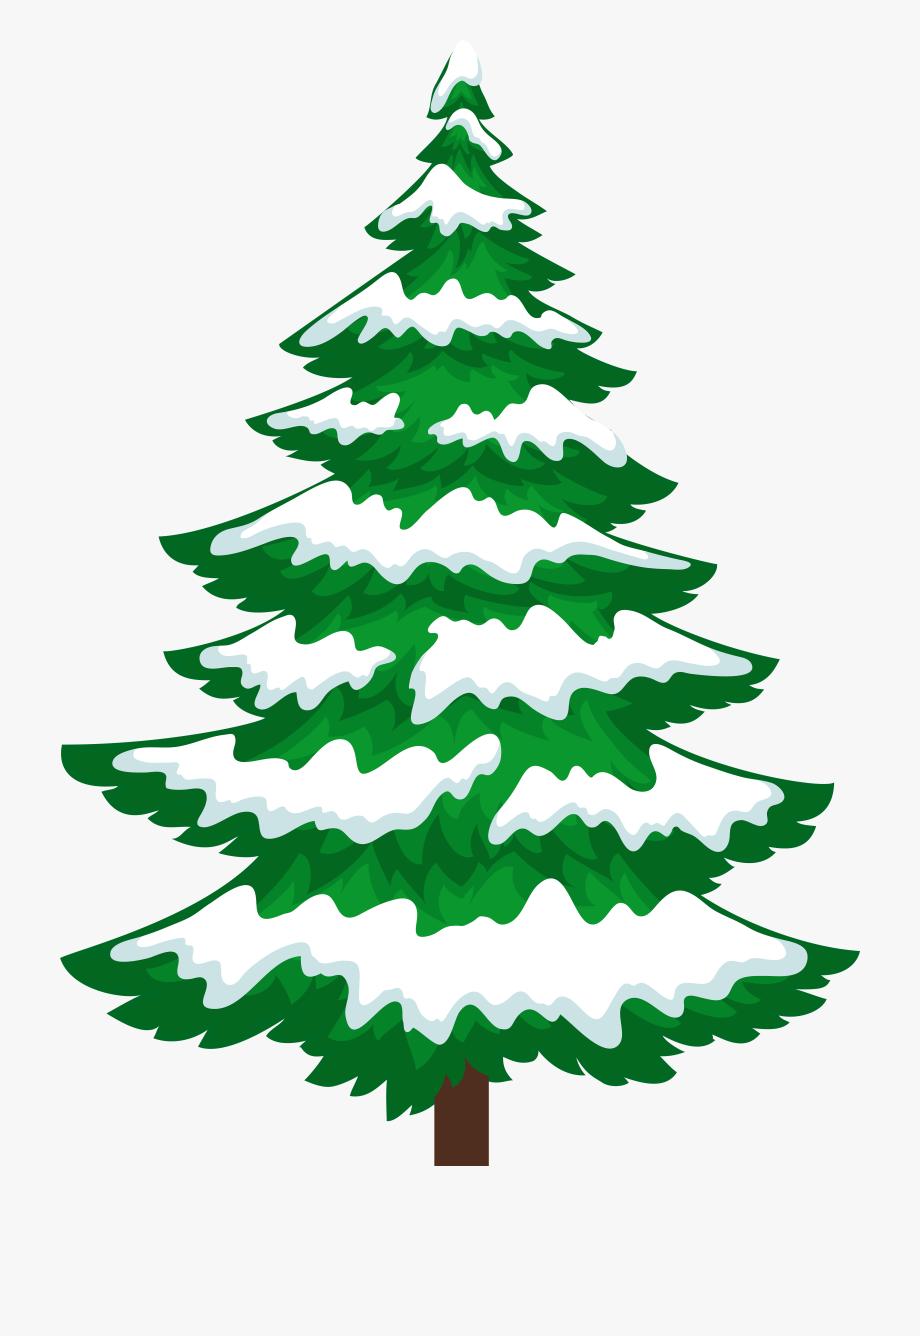 Pine Tree With Snow Transparent Clip Artu200b Gallery.